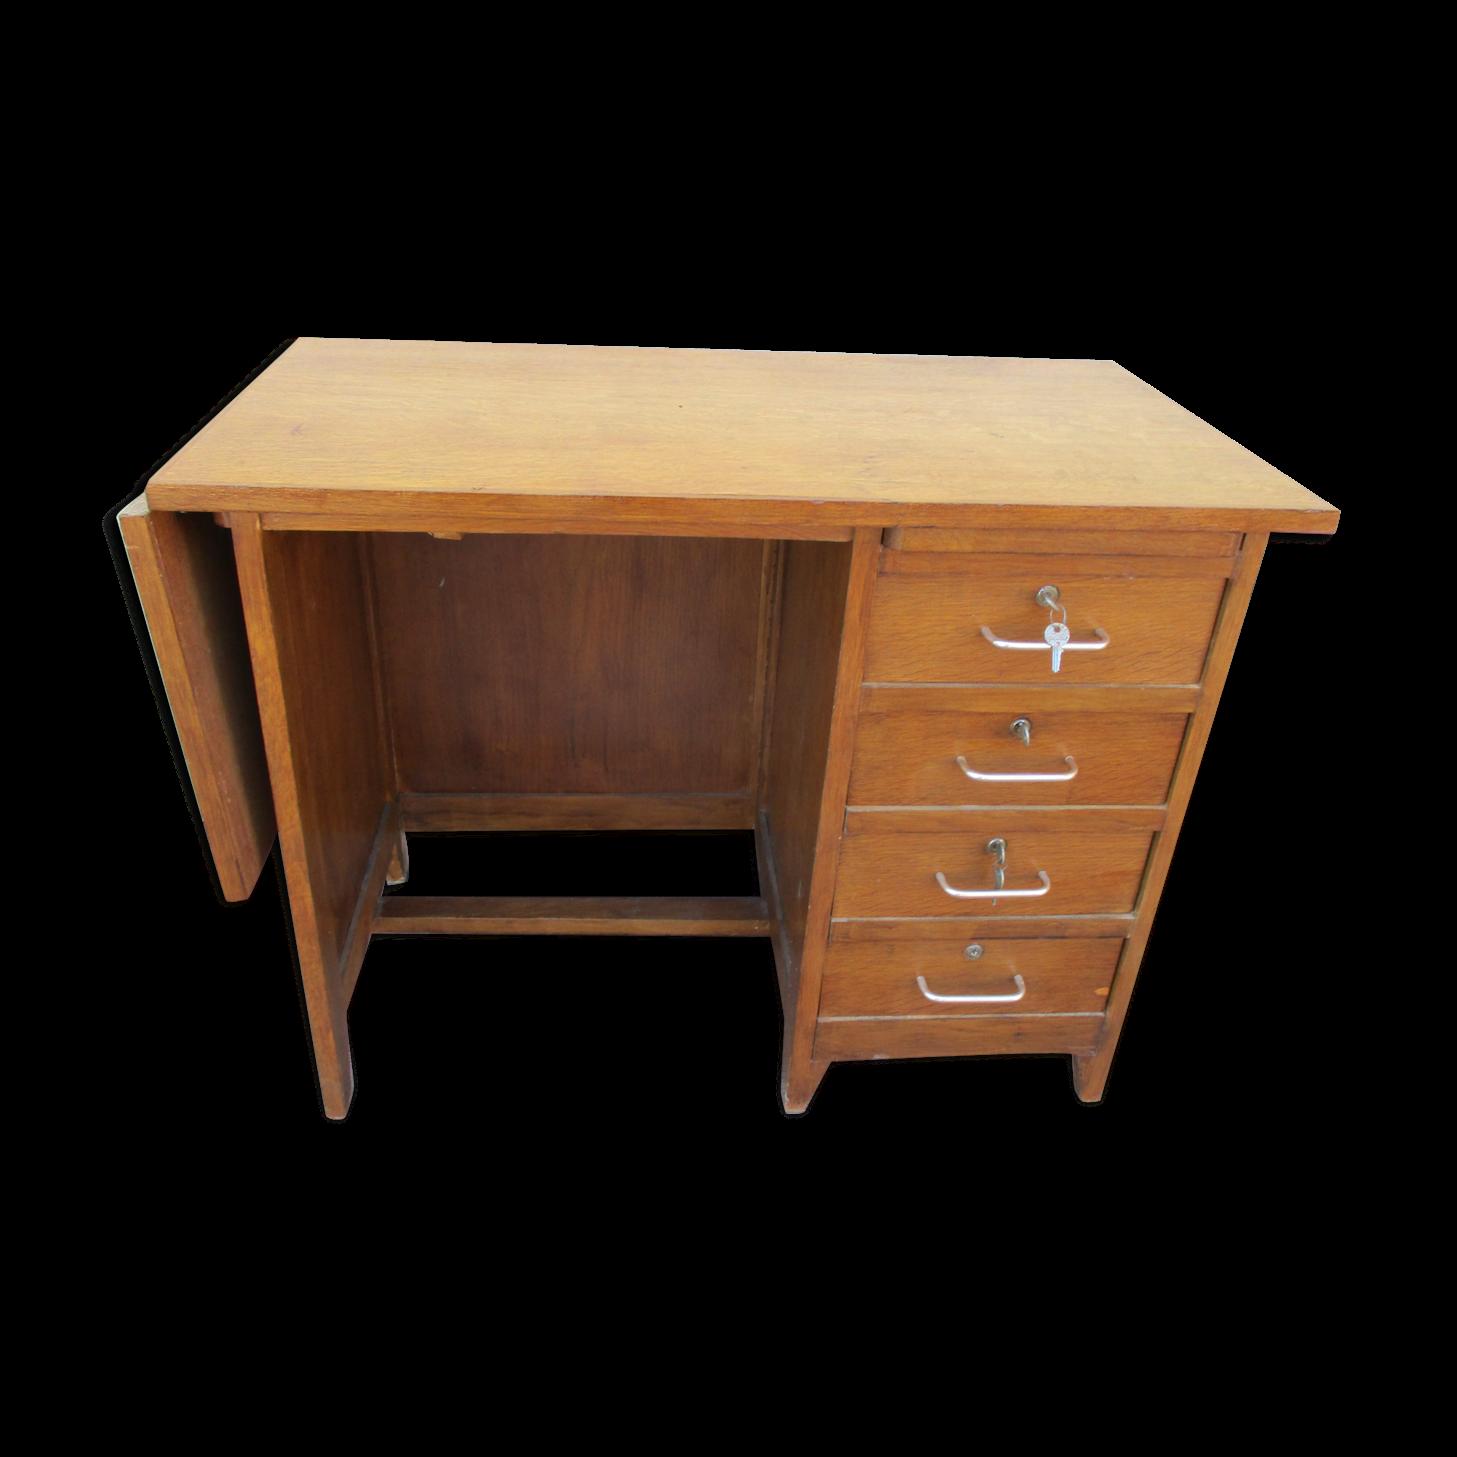 Bureau chenet vintage style anglais avec rallonge with bureau style anglais - Lampe de bureau style anglais ...